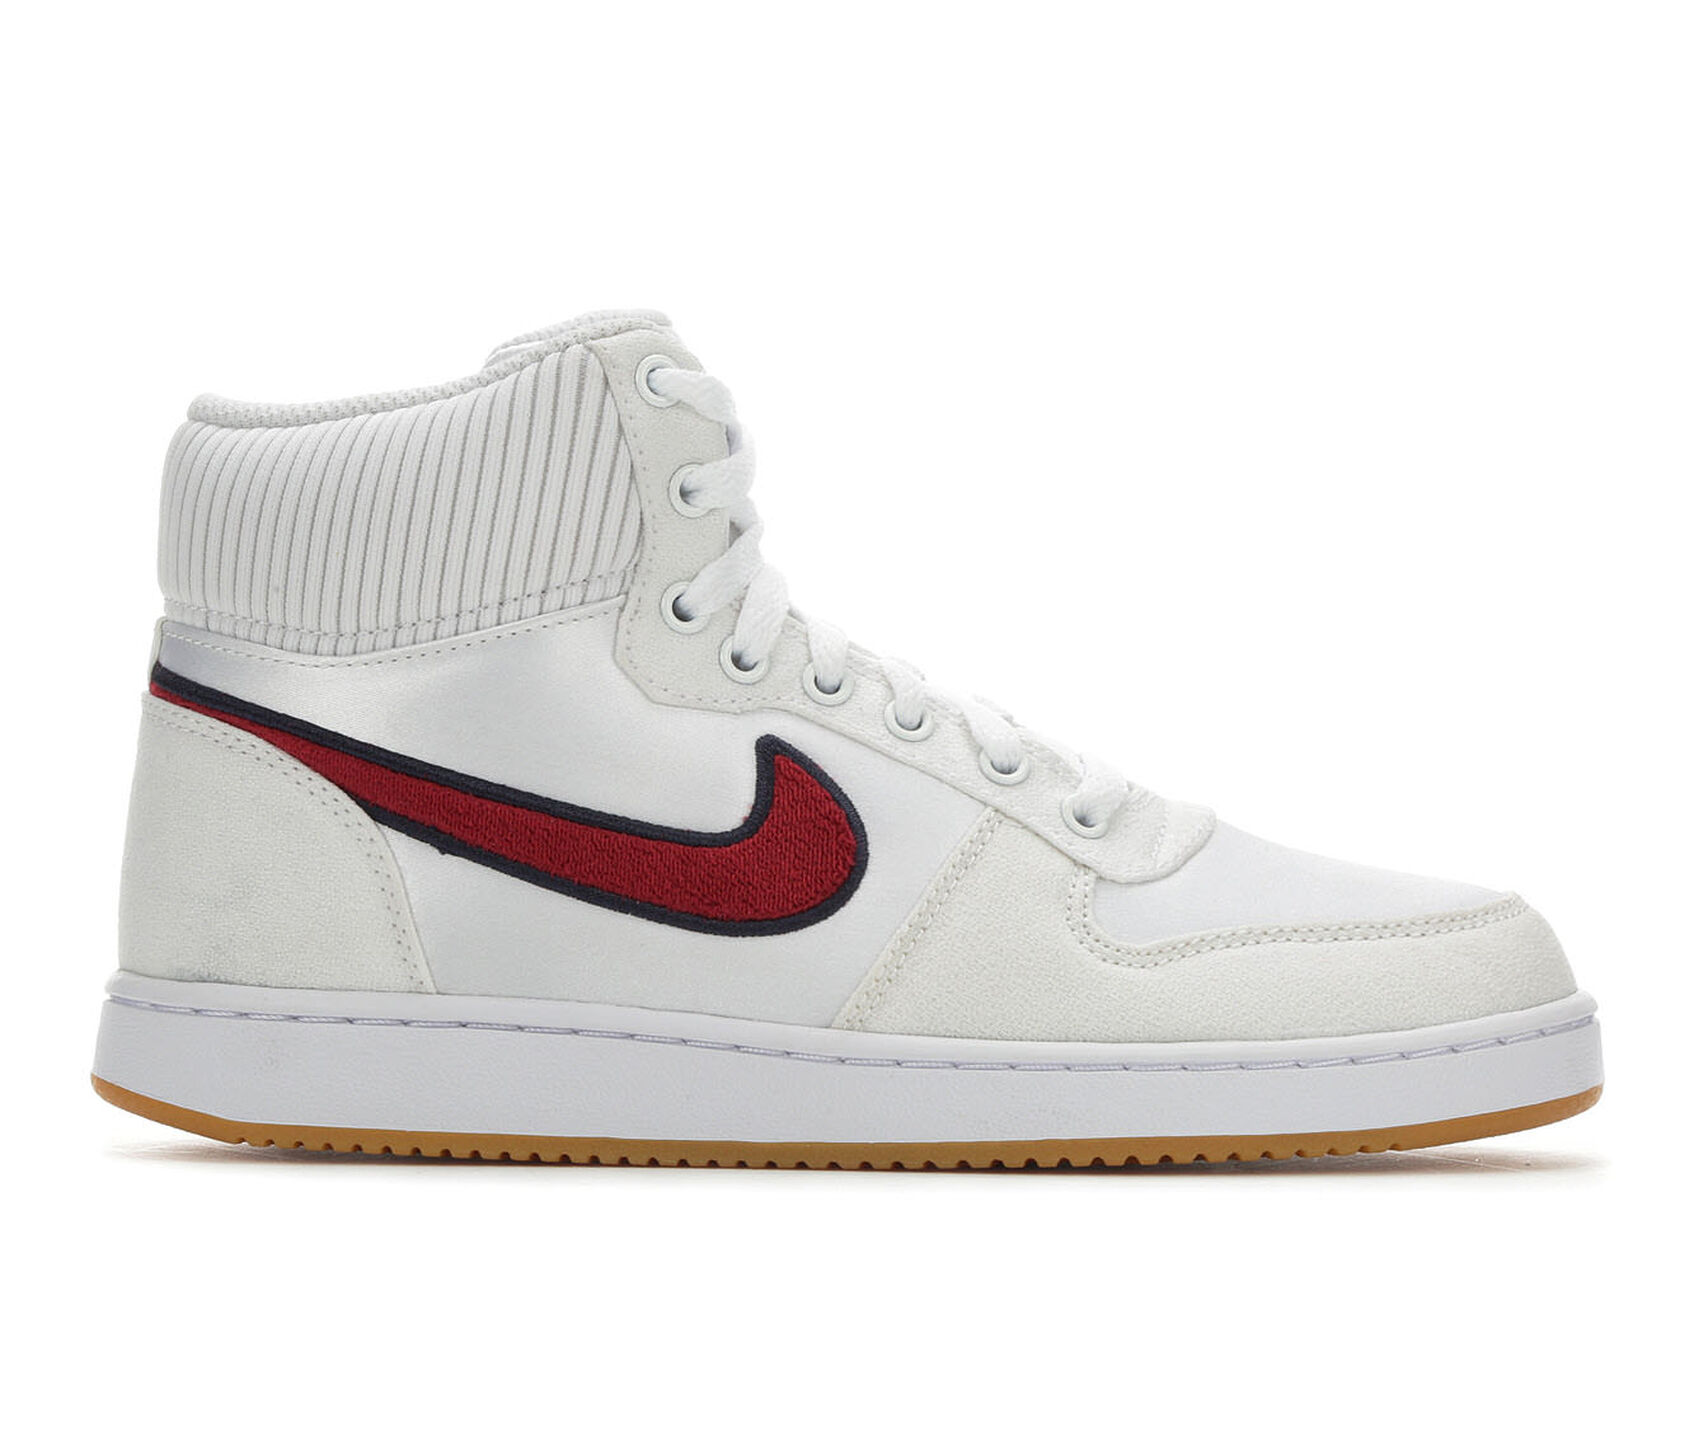 e7538cdc021a Women s Nike Ebernon Mid Premium Fashion Basketball Shoes